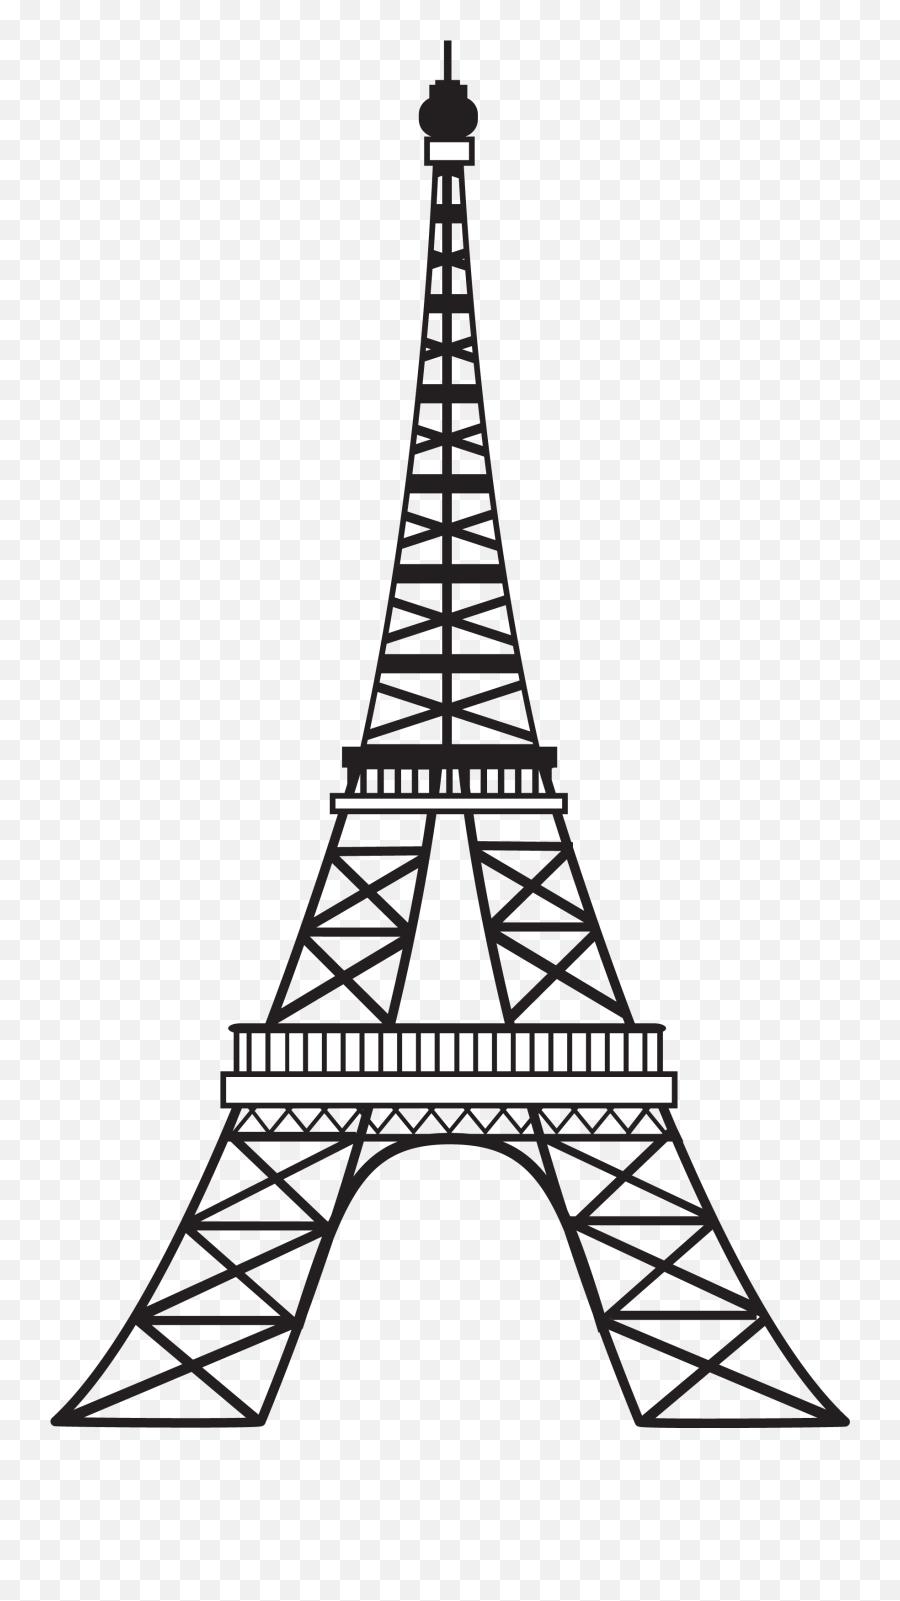 Free Eiffel Tower Clip Art Download Free Clip Art Free - Eiffel Tower Clipart Emoji,Eiffel Tower Emoji